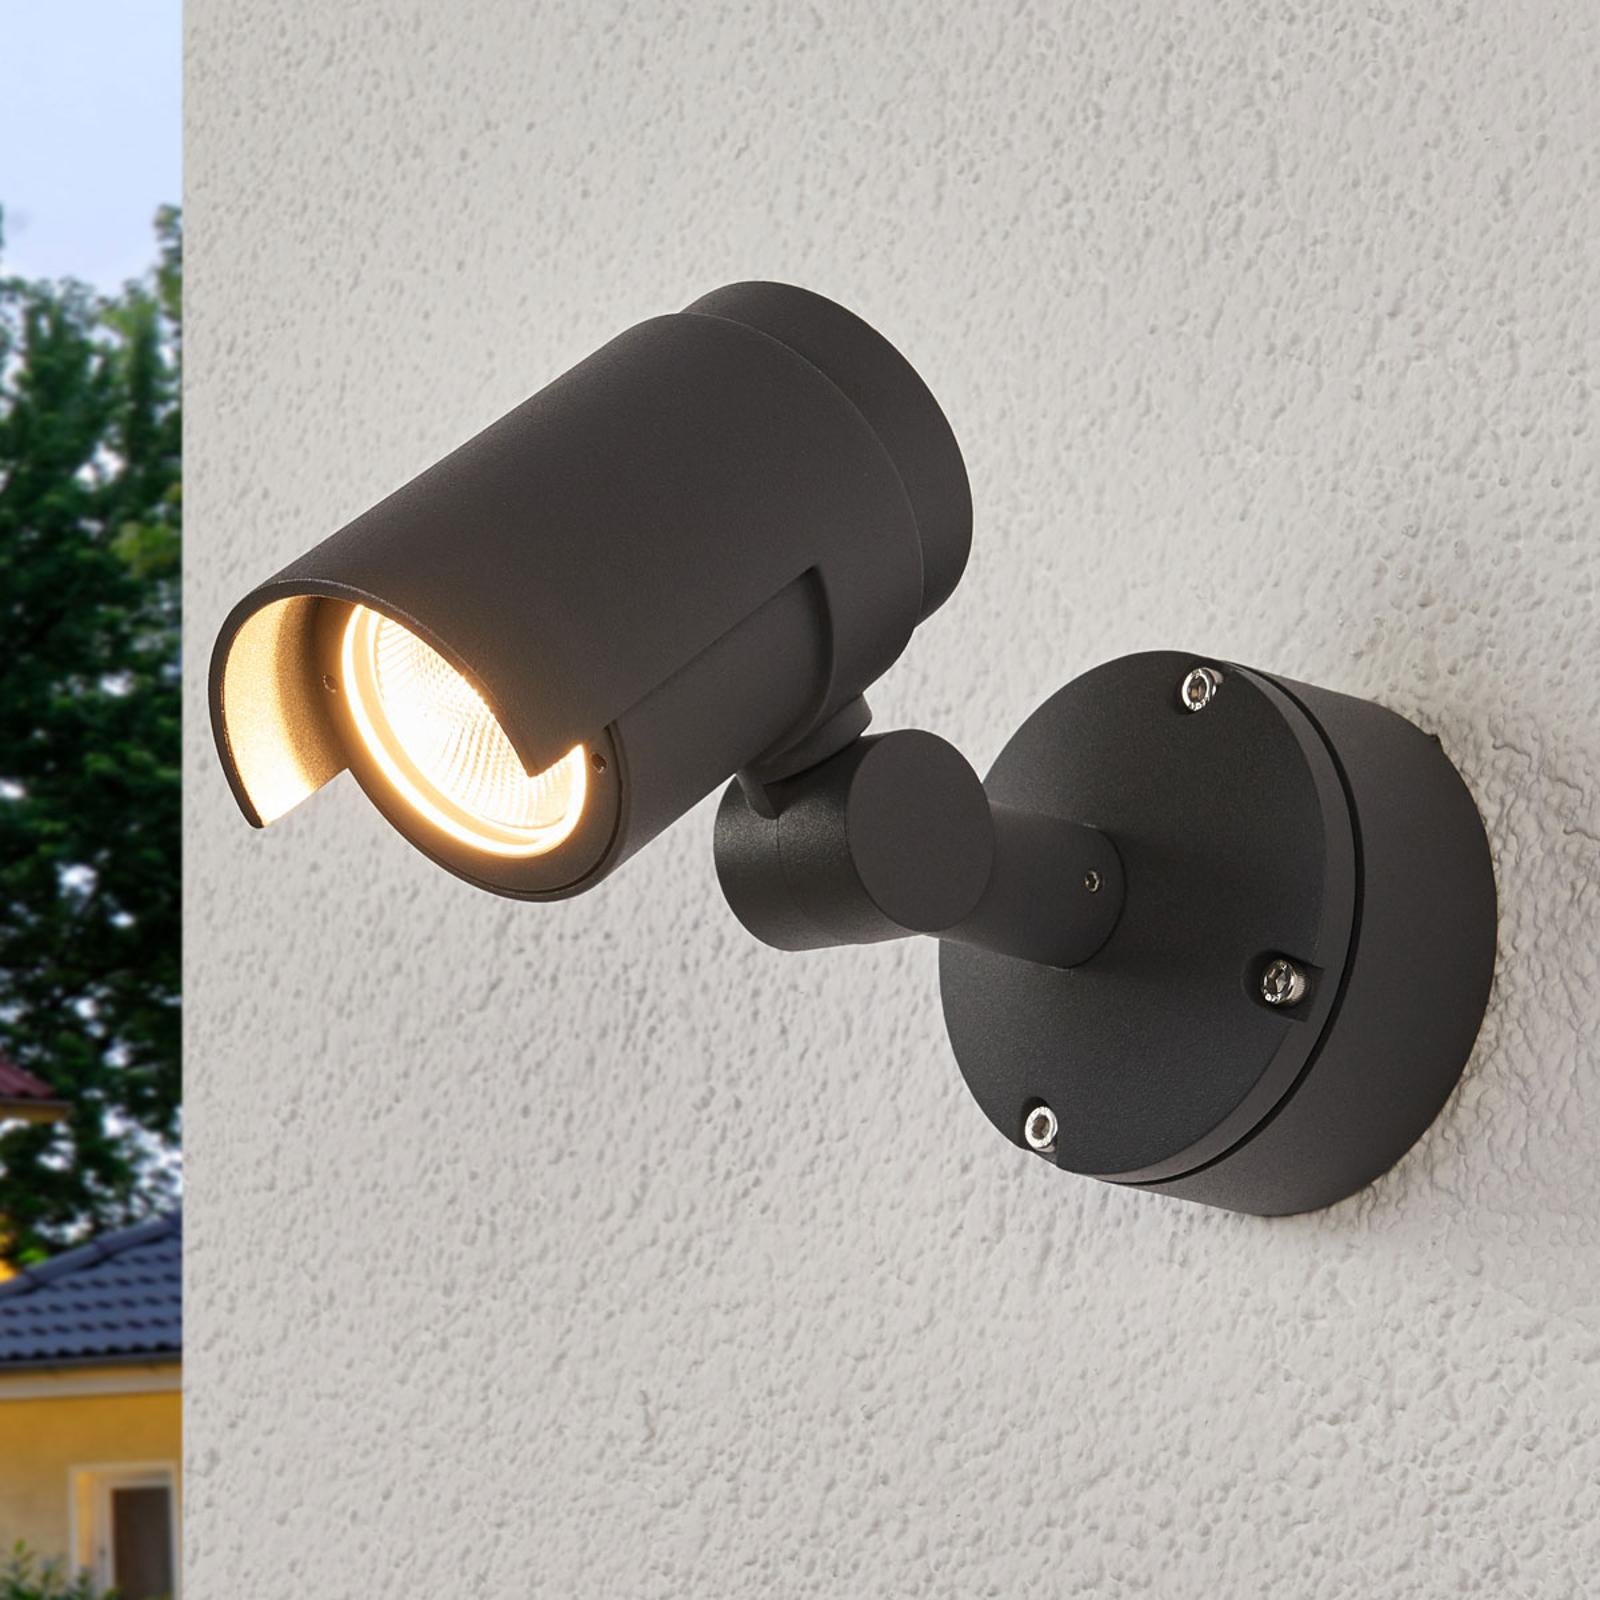 LED-Außenstrahler Beatrix in Dunkelgrau